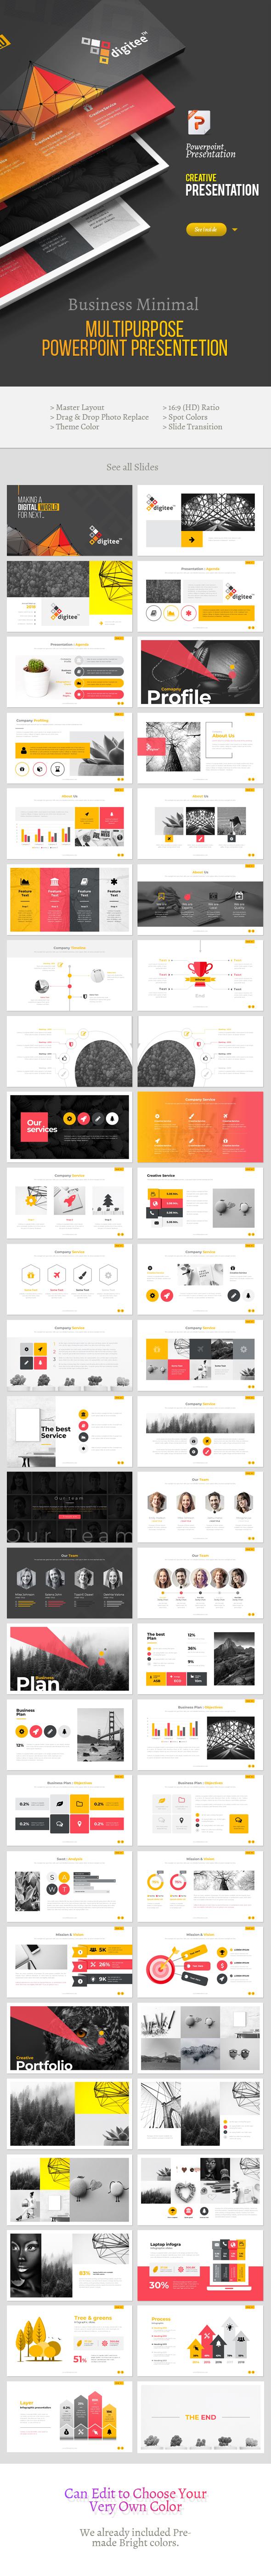 Digitee Business Multipurpose Powerpoint Template - Business PowerPoint Templates